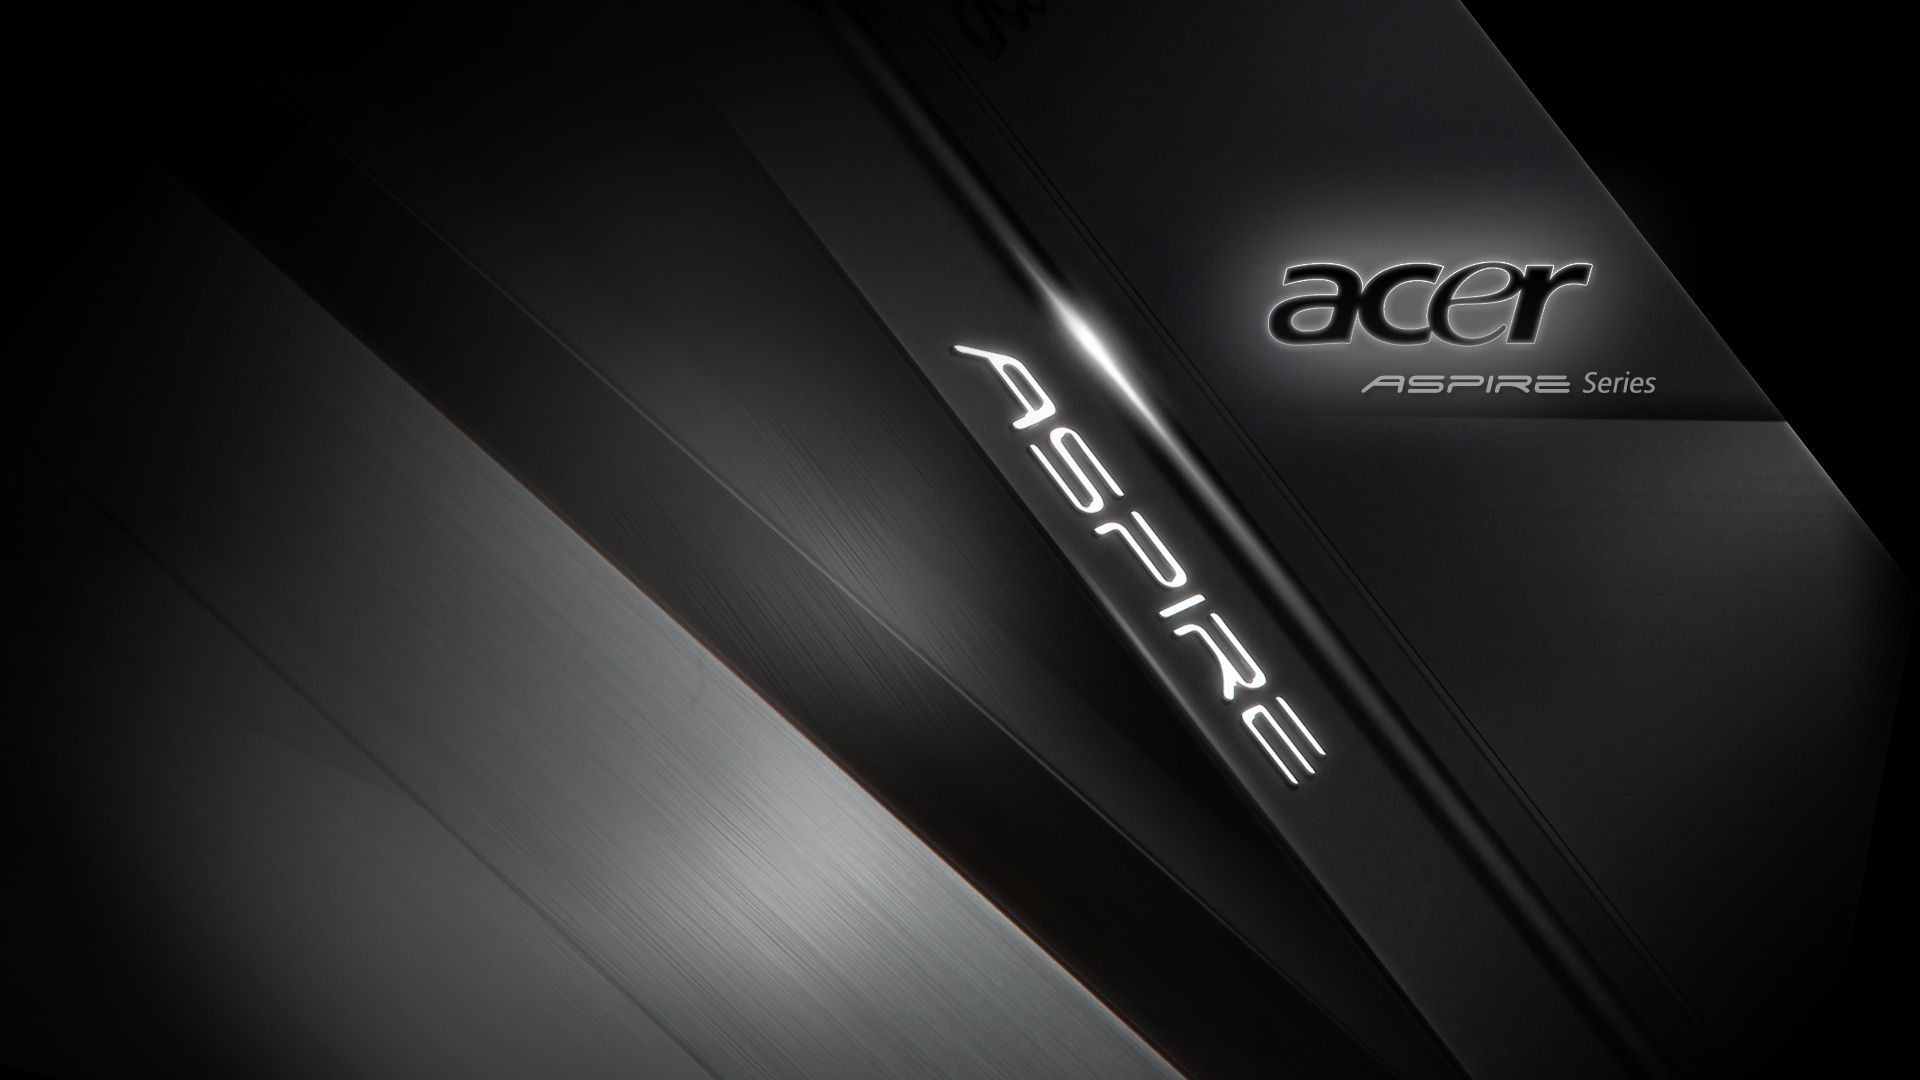 Wallpaper Acer Desktop